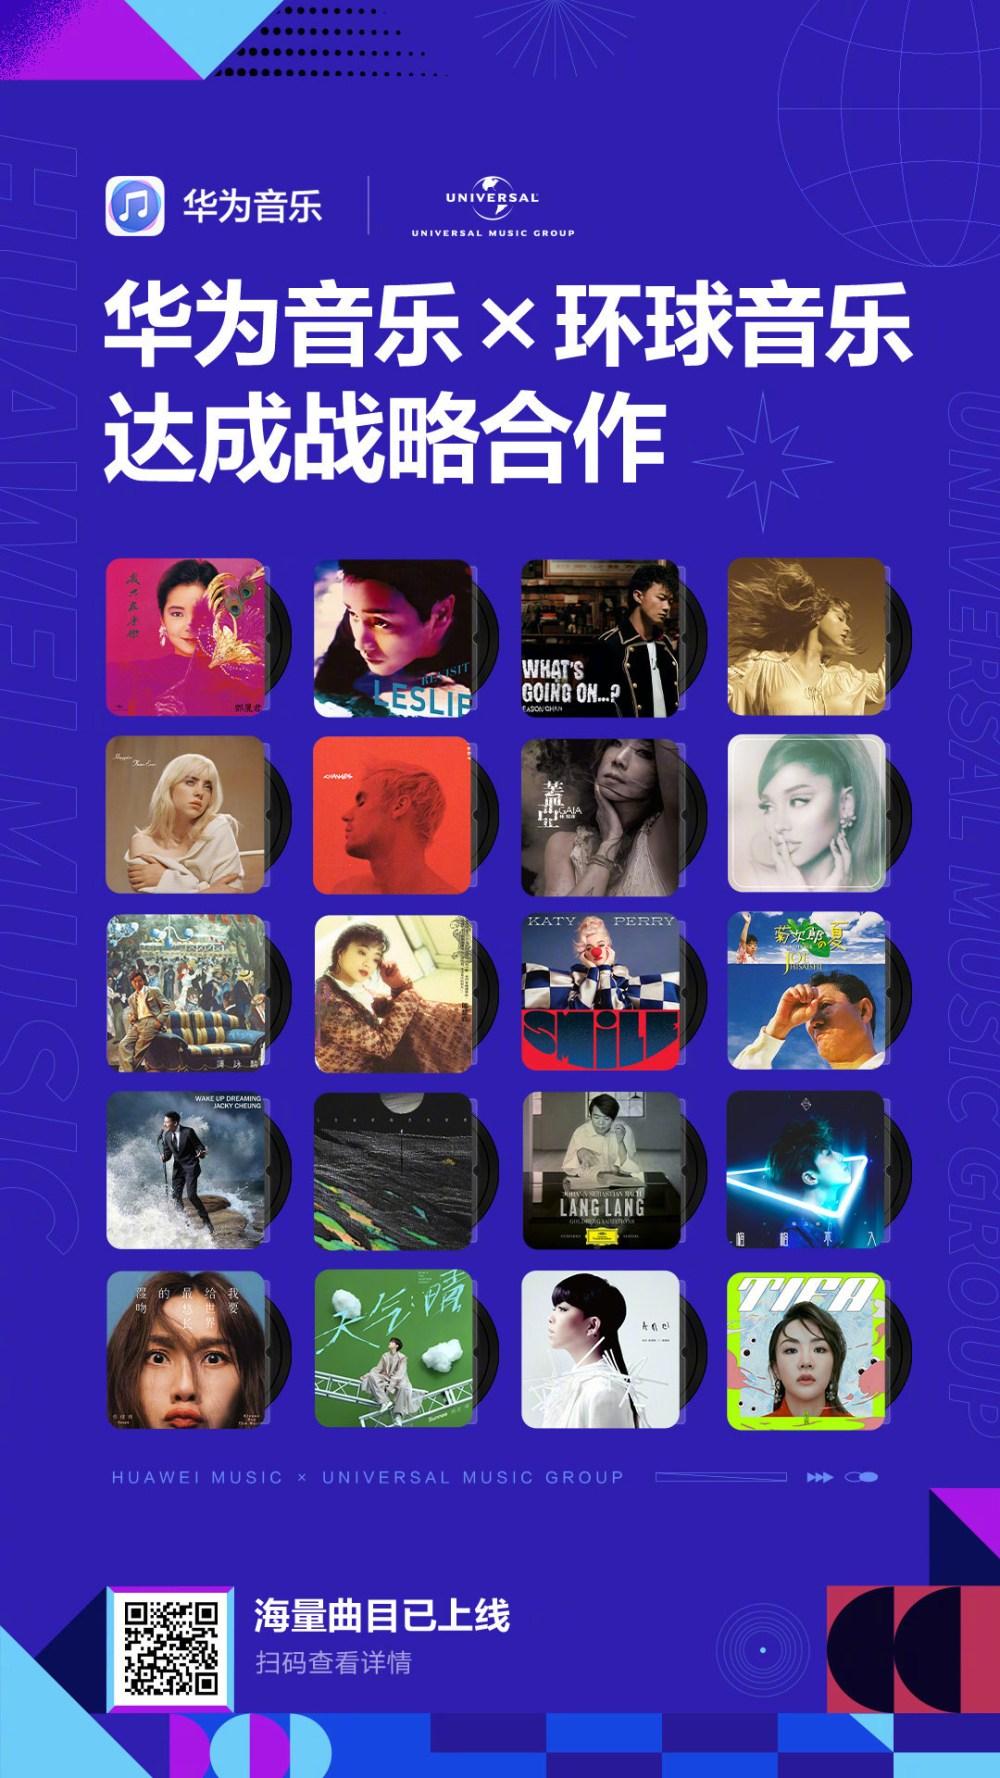 Huawei Music and Universal Music